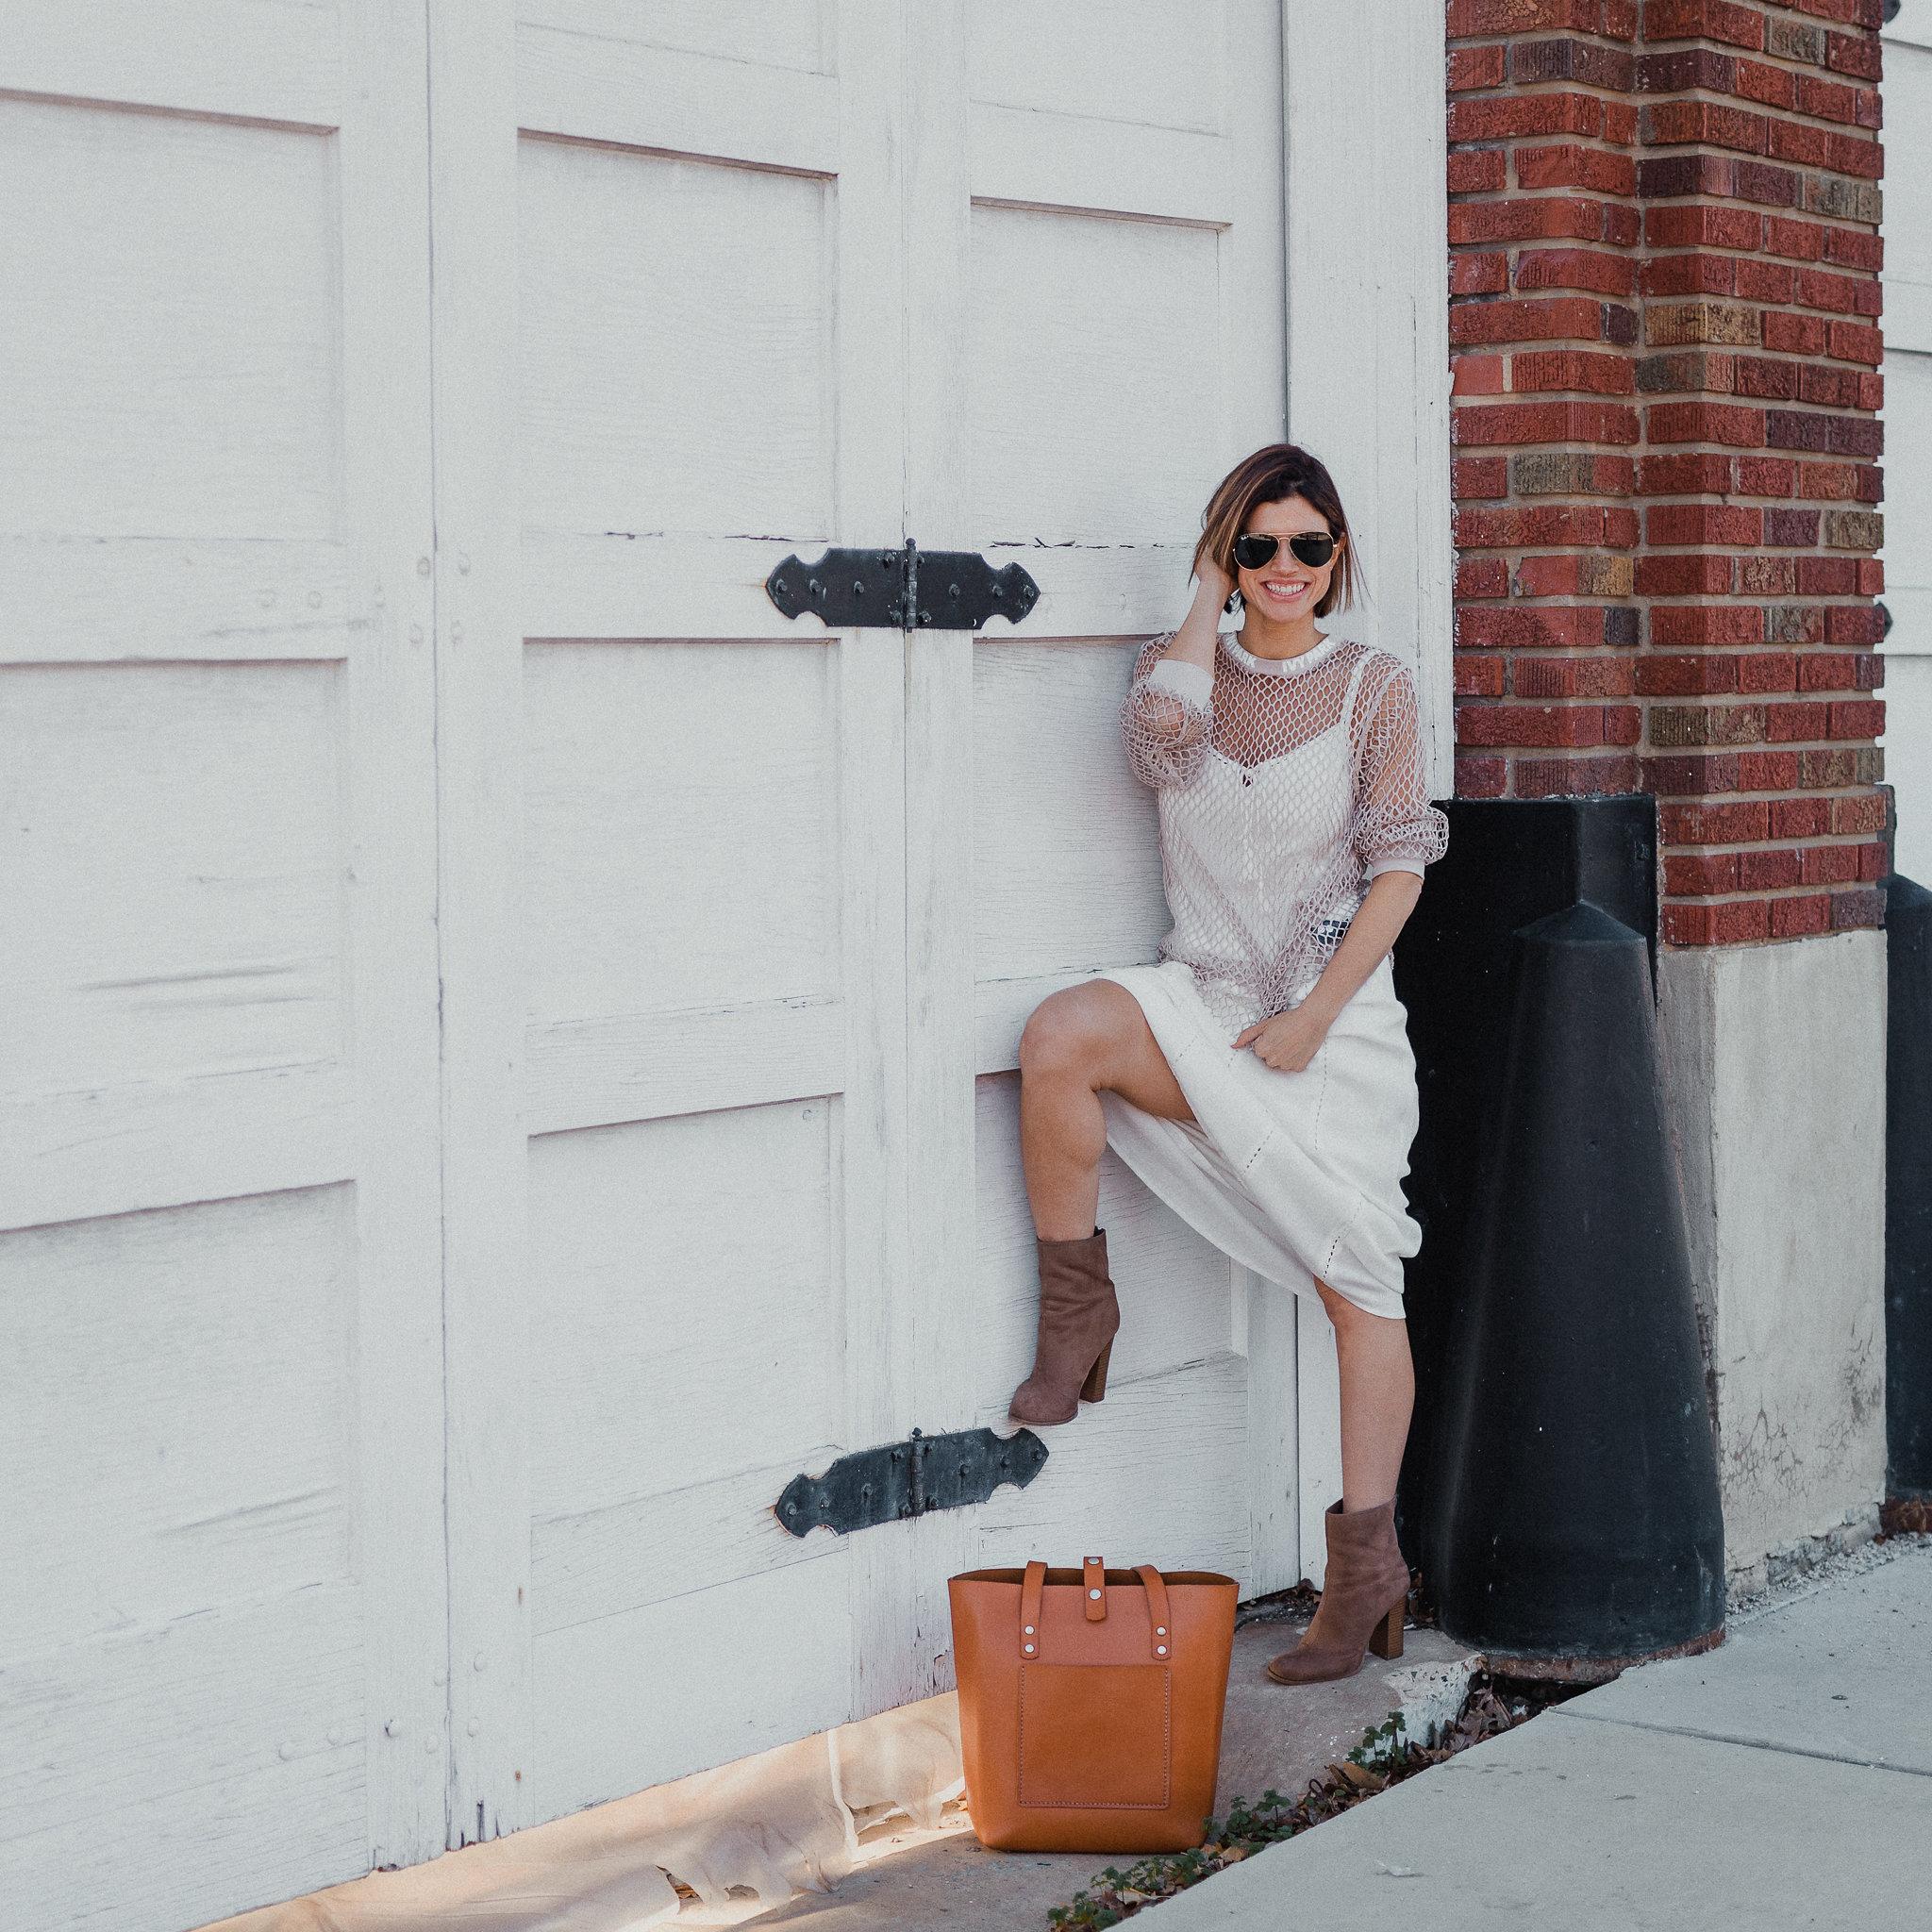 fashion-blogger-looks-style-tips-advice.jpg